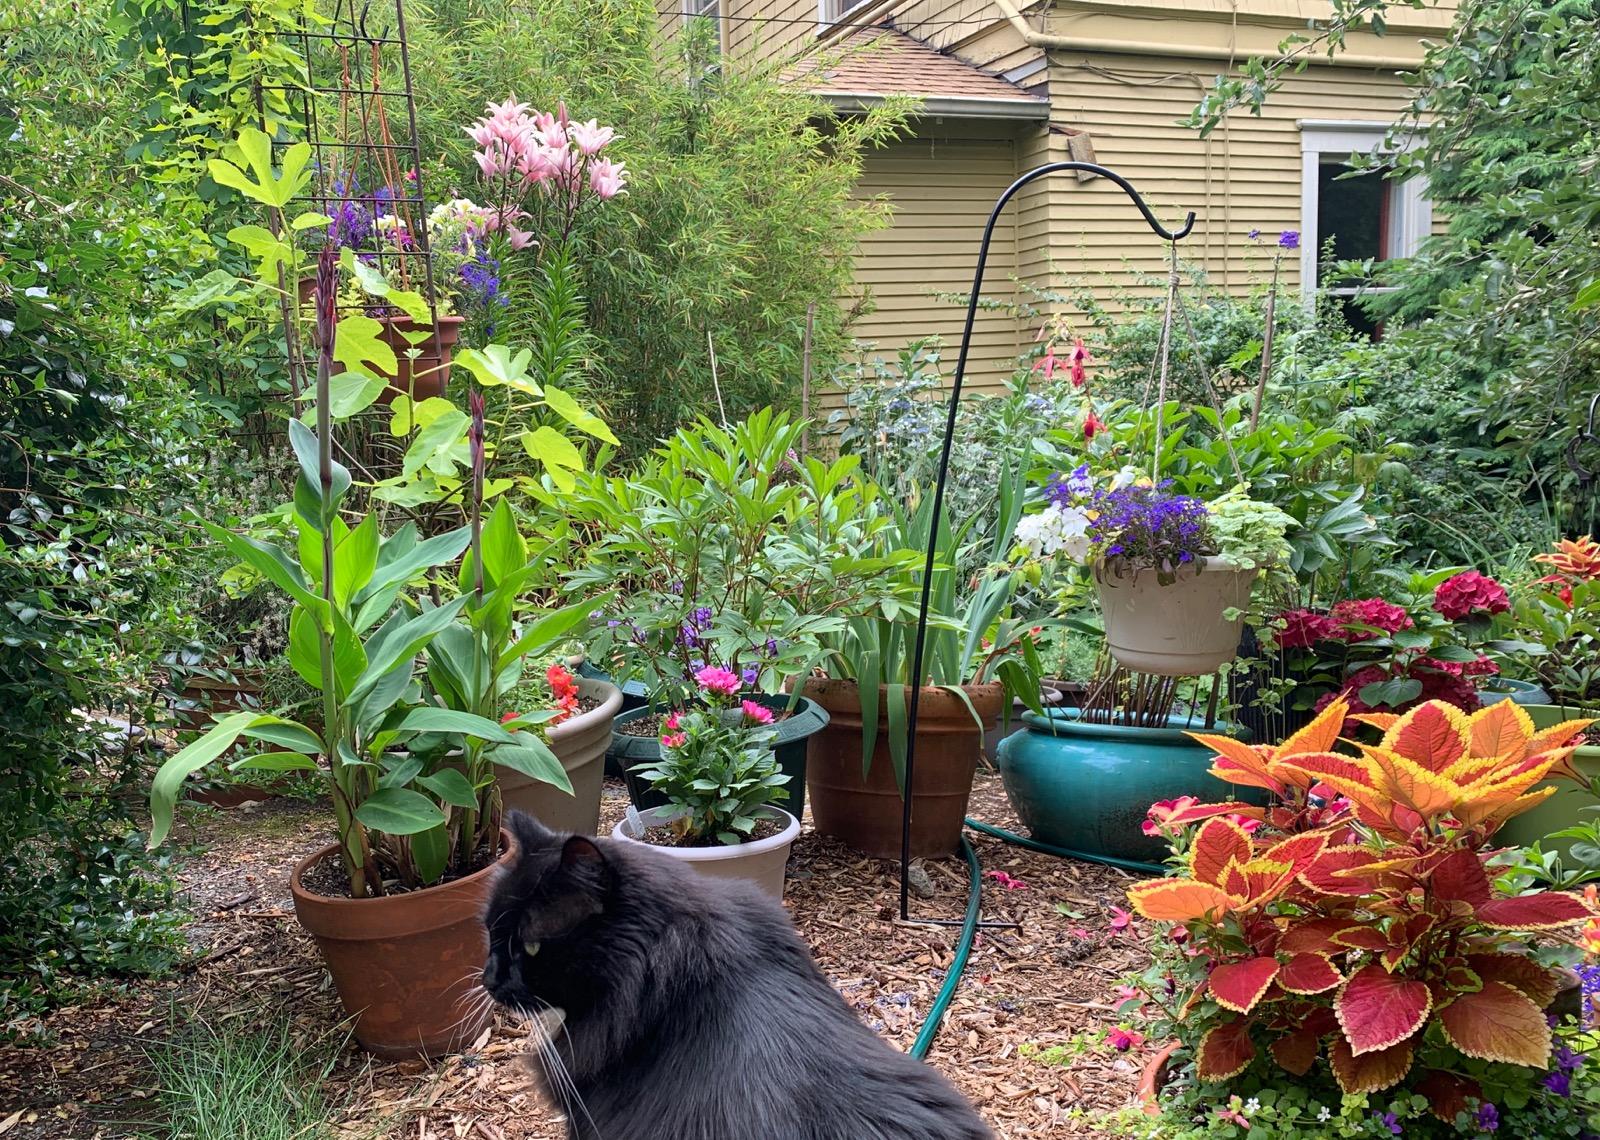 My cat, Fuzz, enjoying the peaceful garden with me.